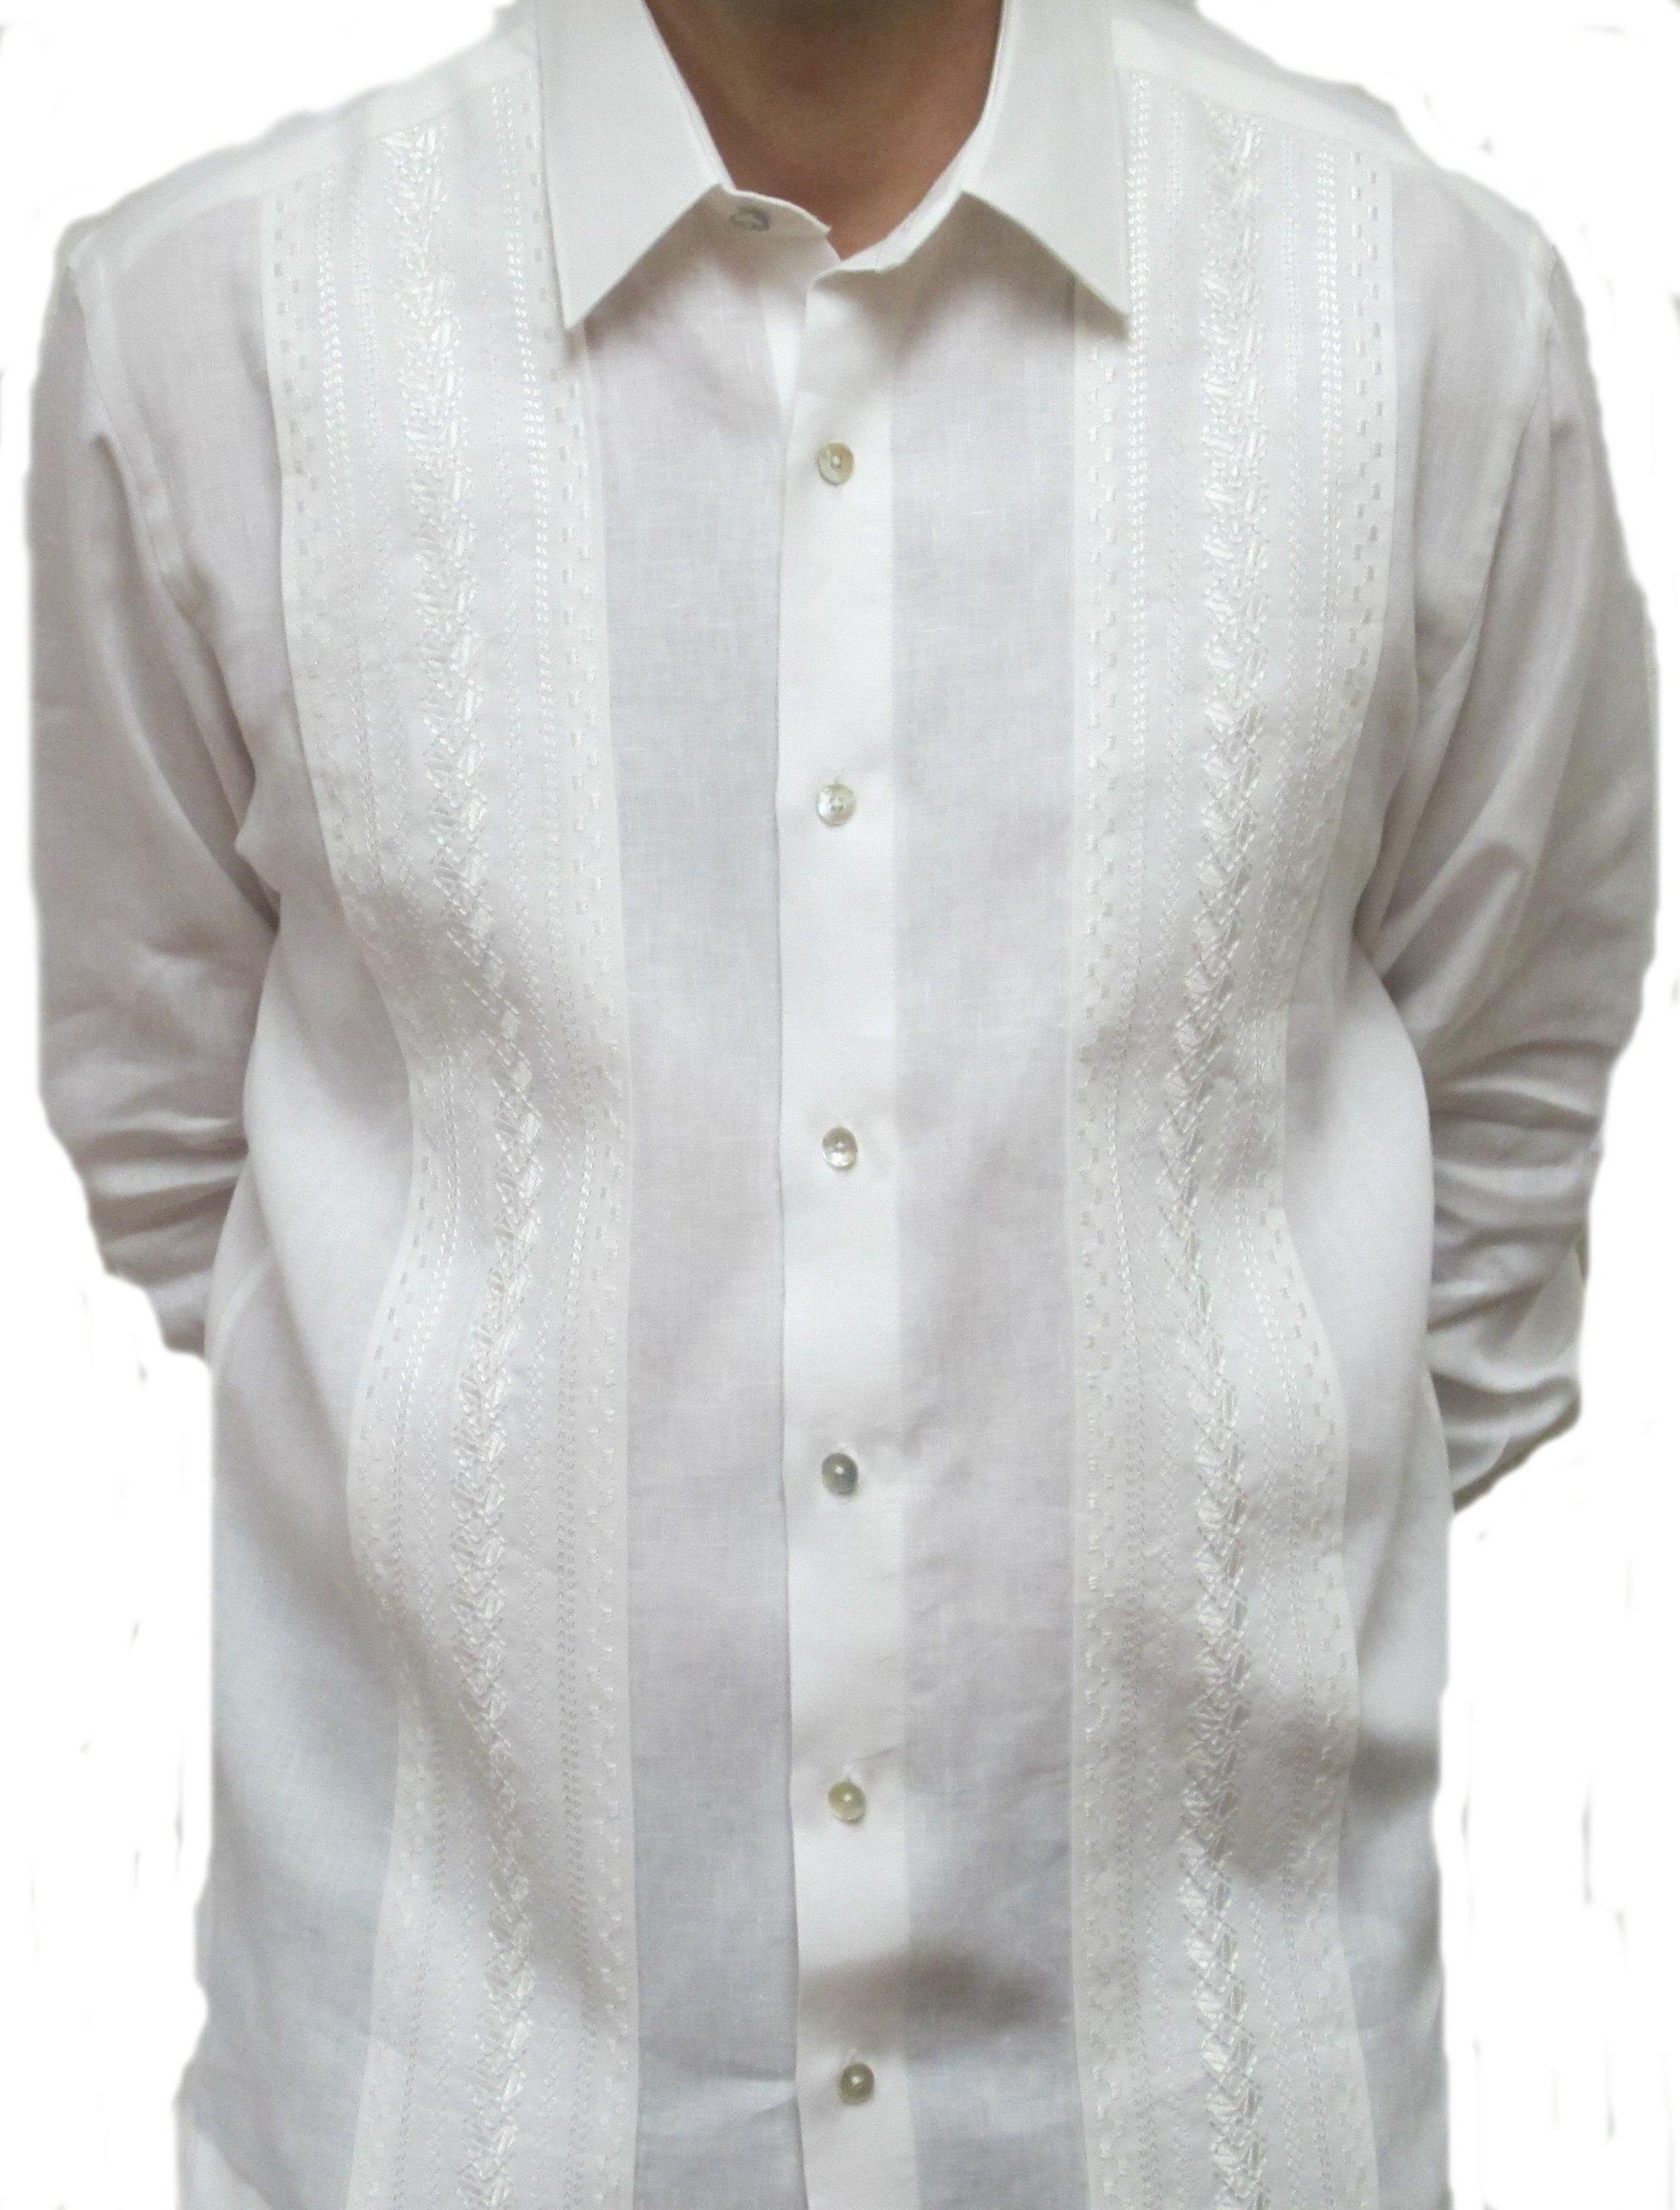 Penner's Men's Elegante Irish Linen Guayabera Shirt - Long Sleeve - White - Large